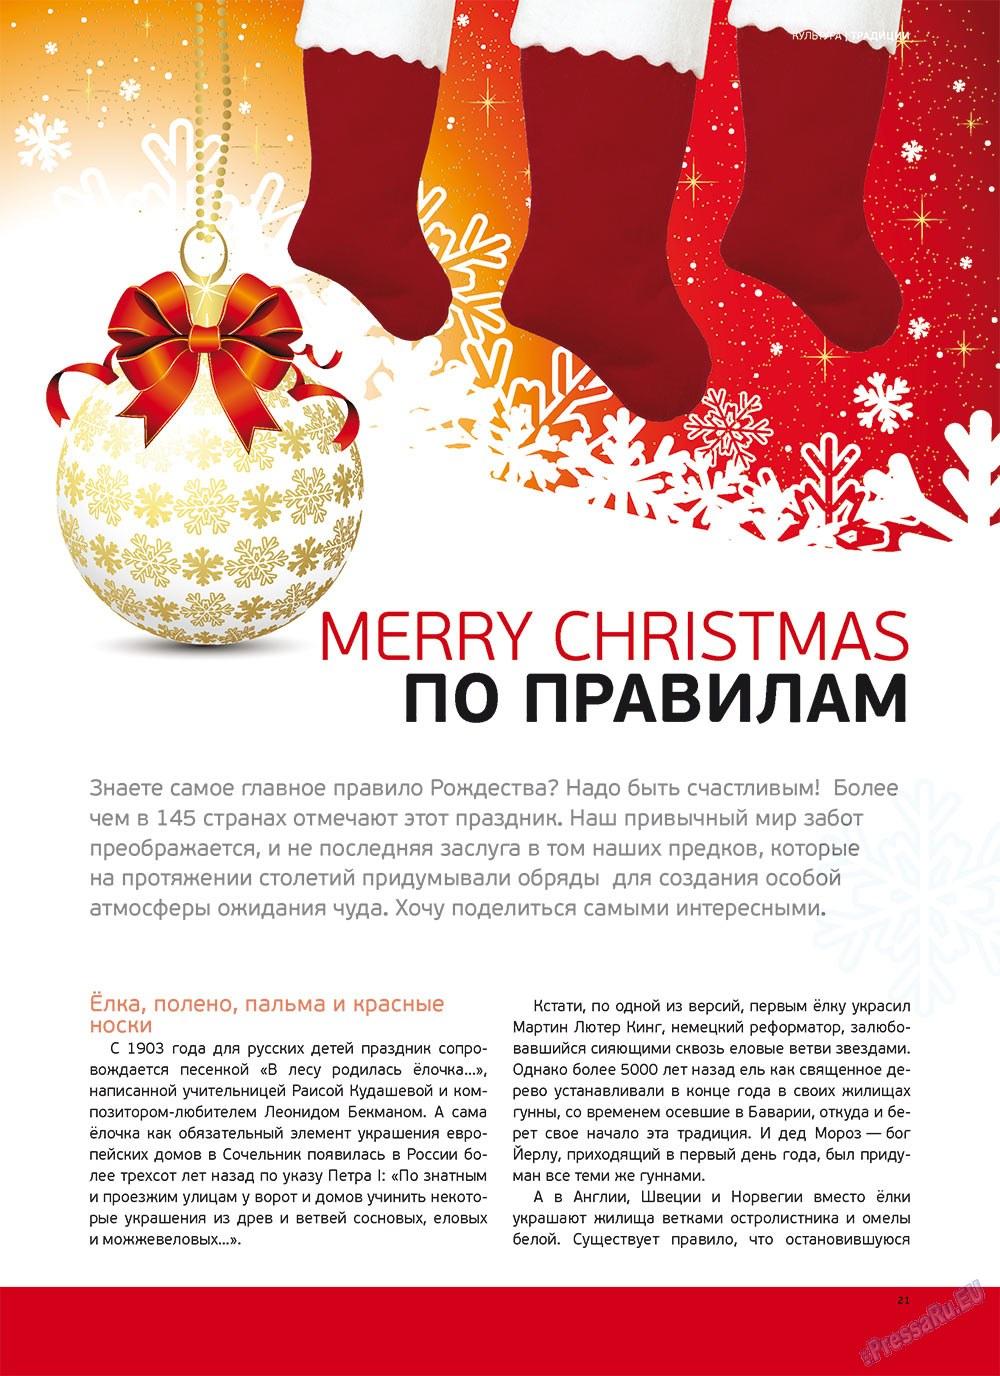 Артек (журнал). 2011 год, номер 5, стр. 23